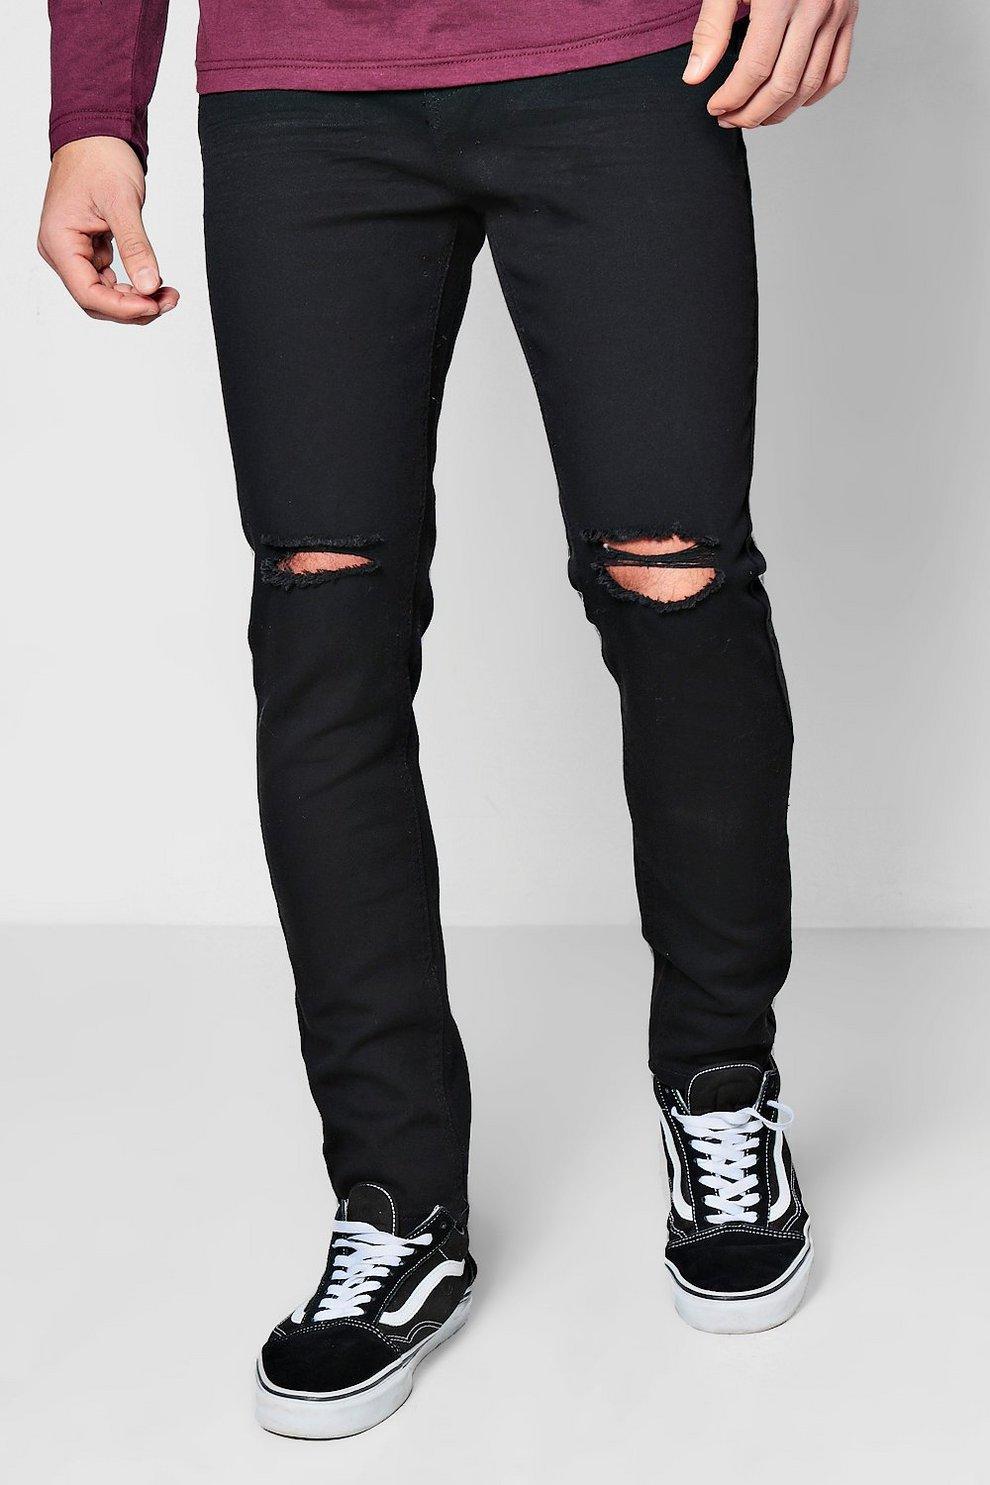 9aa844eef0 Skinny Fit Ripped Knee Denim Jeans Black. Hover to zoom